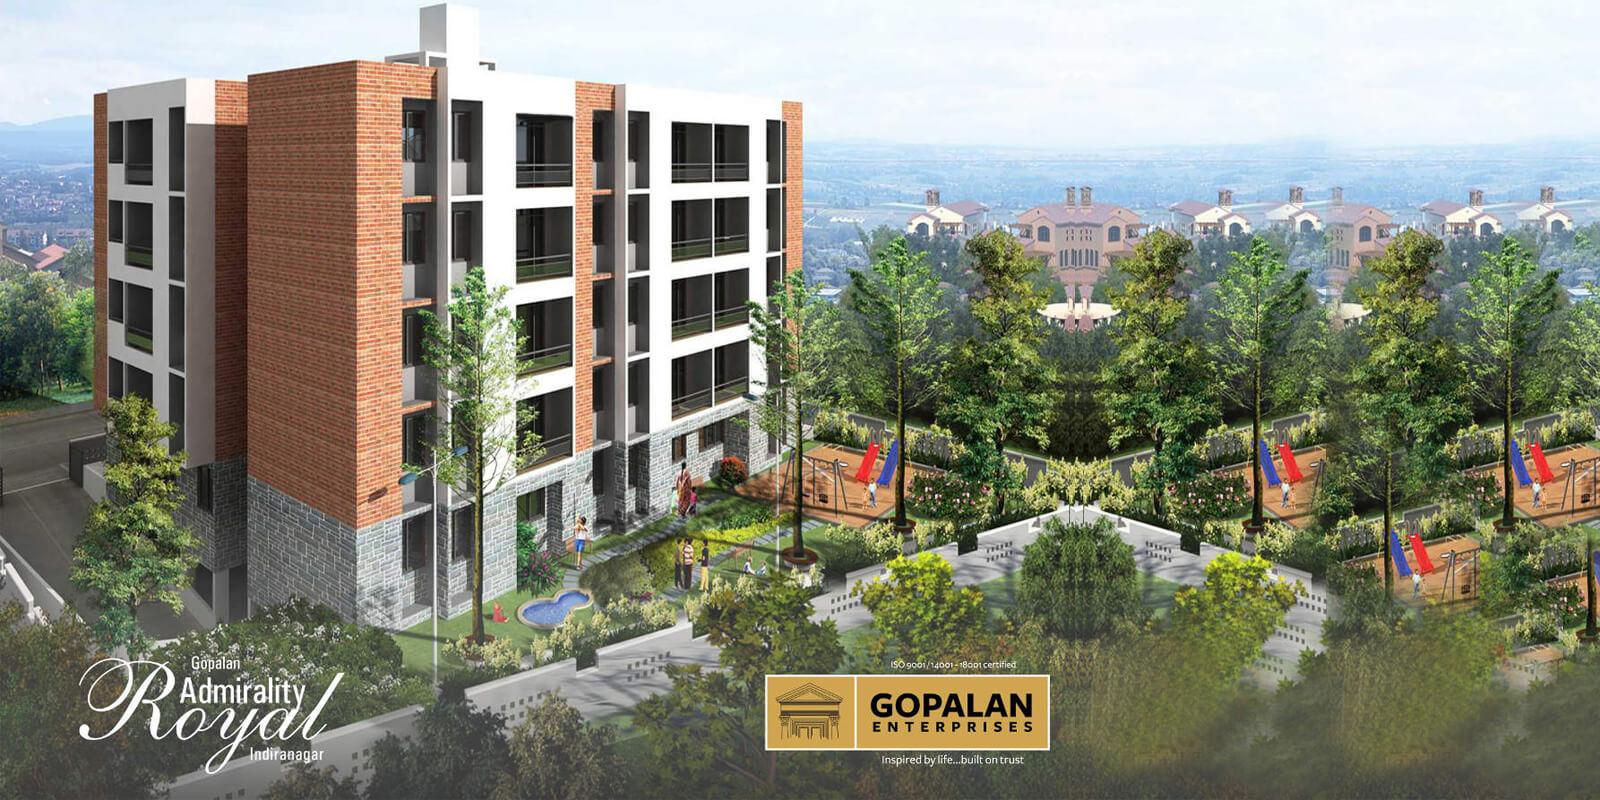 gopalan admirality royal project large image1